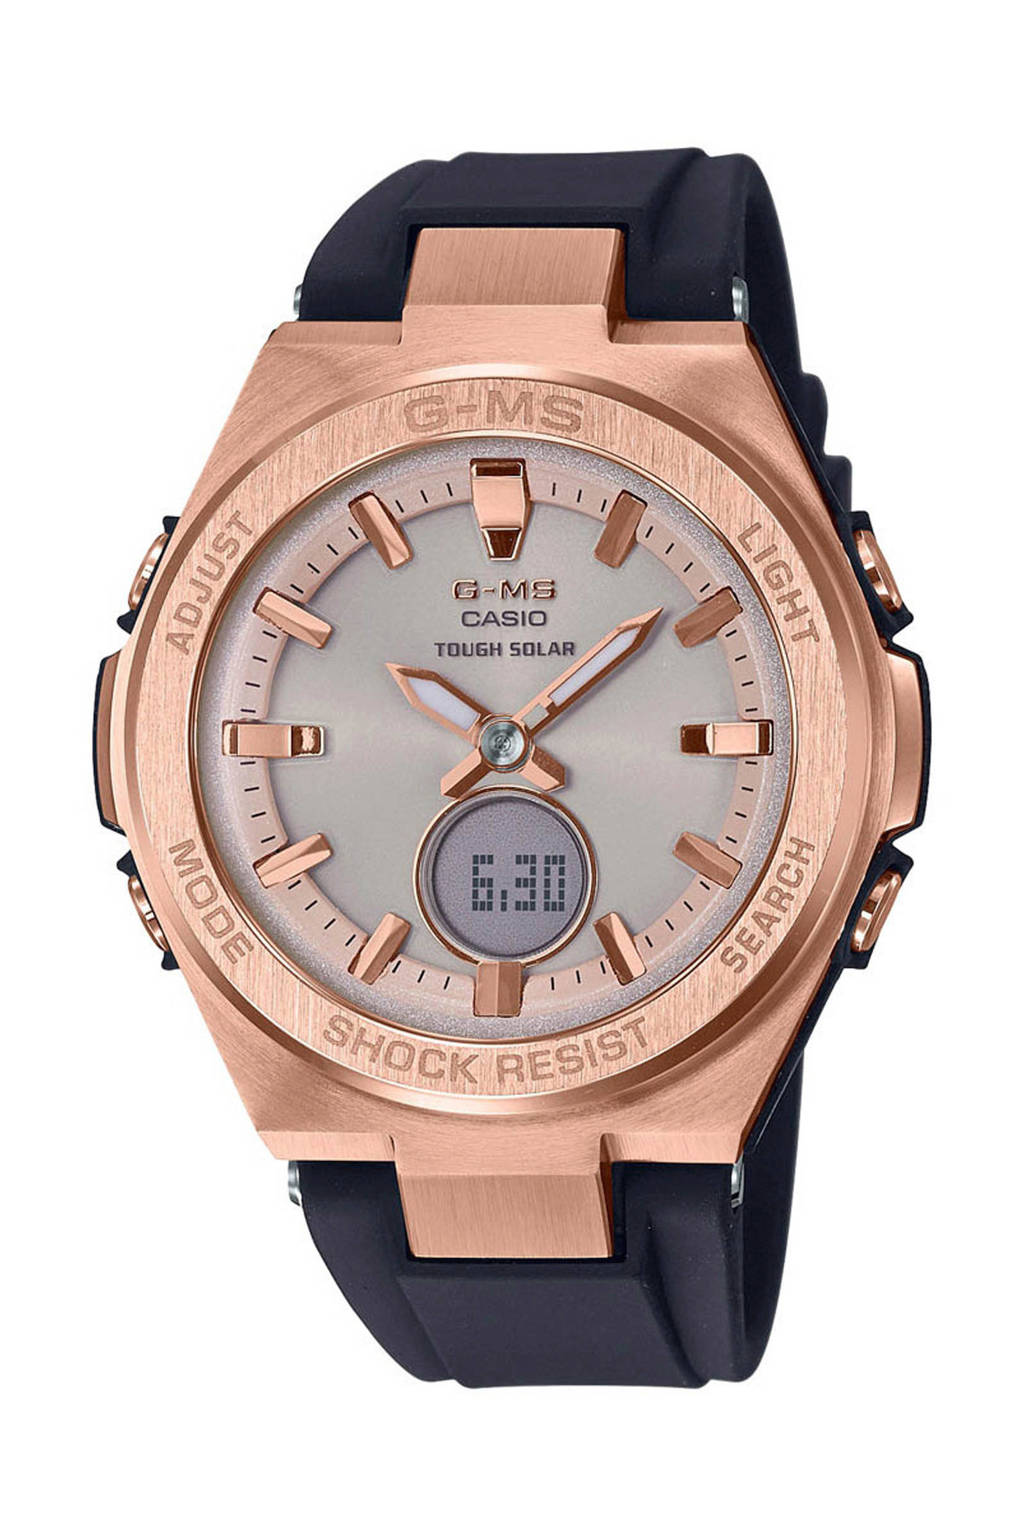 Baby-G horloge  horloge MSG-S200G-1AER., Zwart